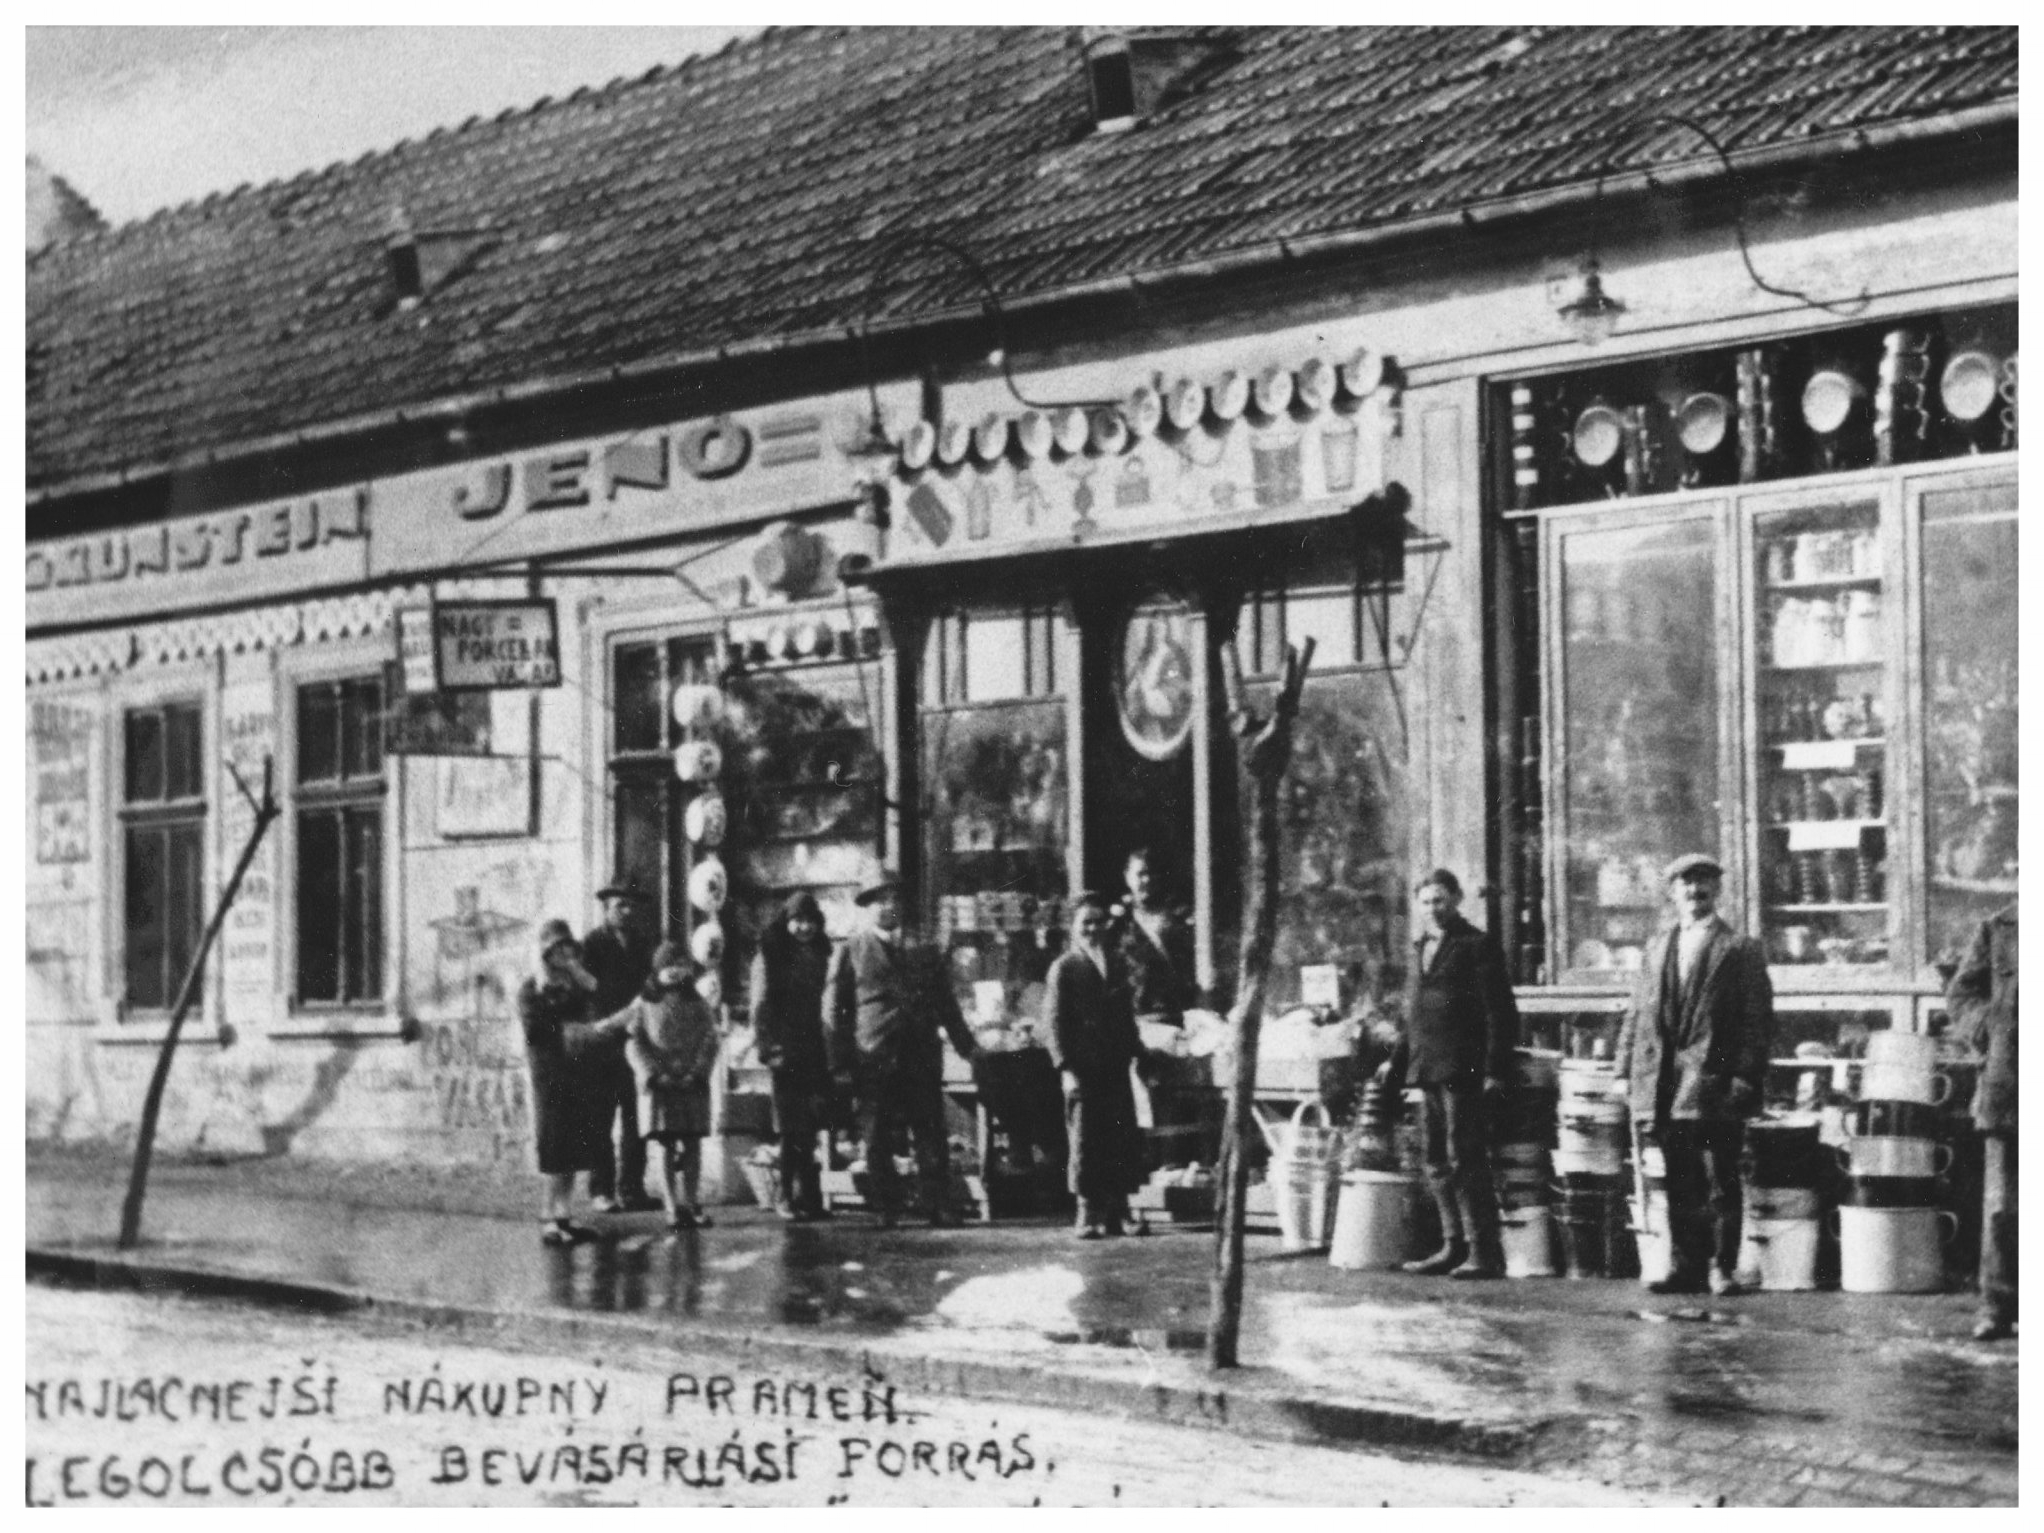 Grunstein housewares store, Nove Zamky, Slovakia 1930's